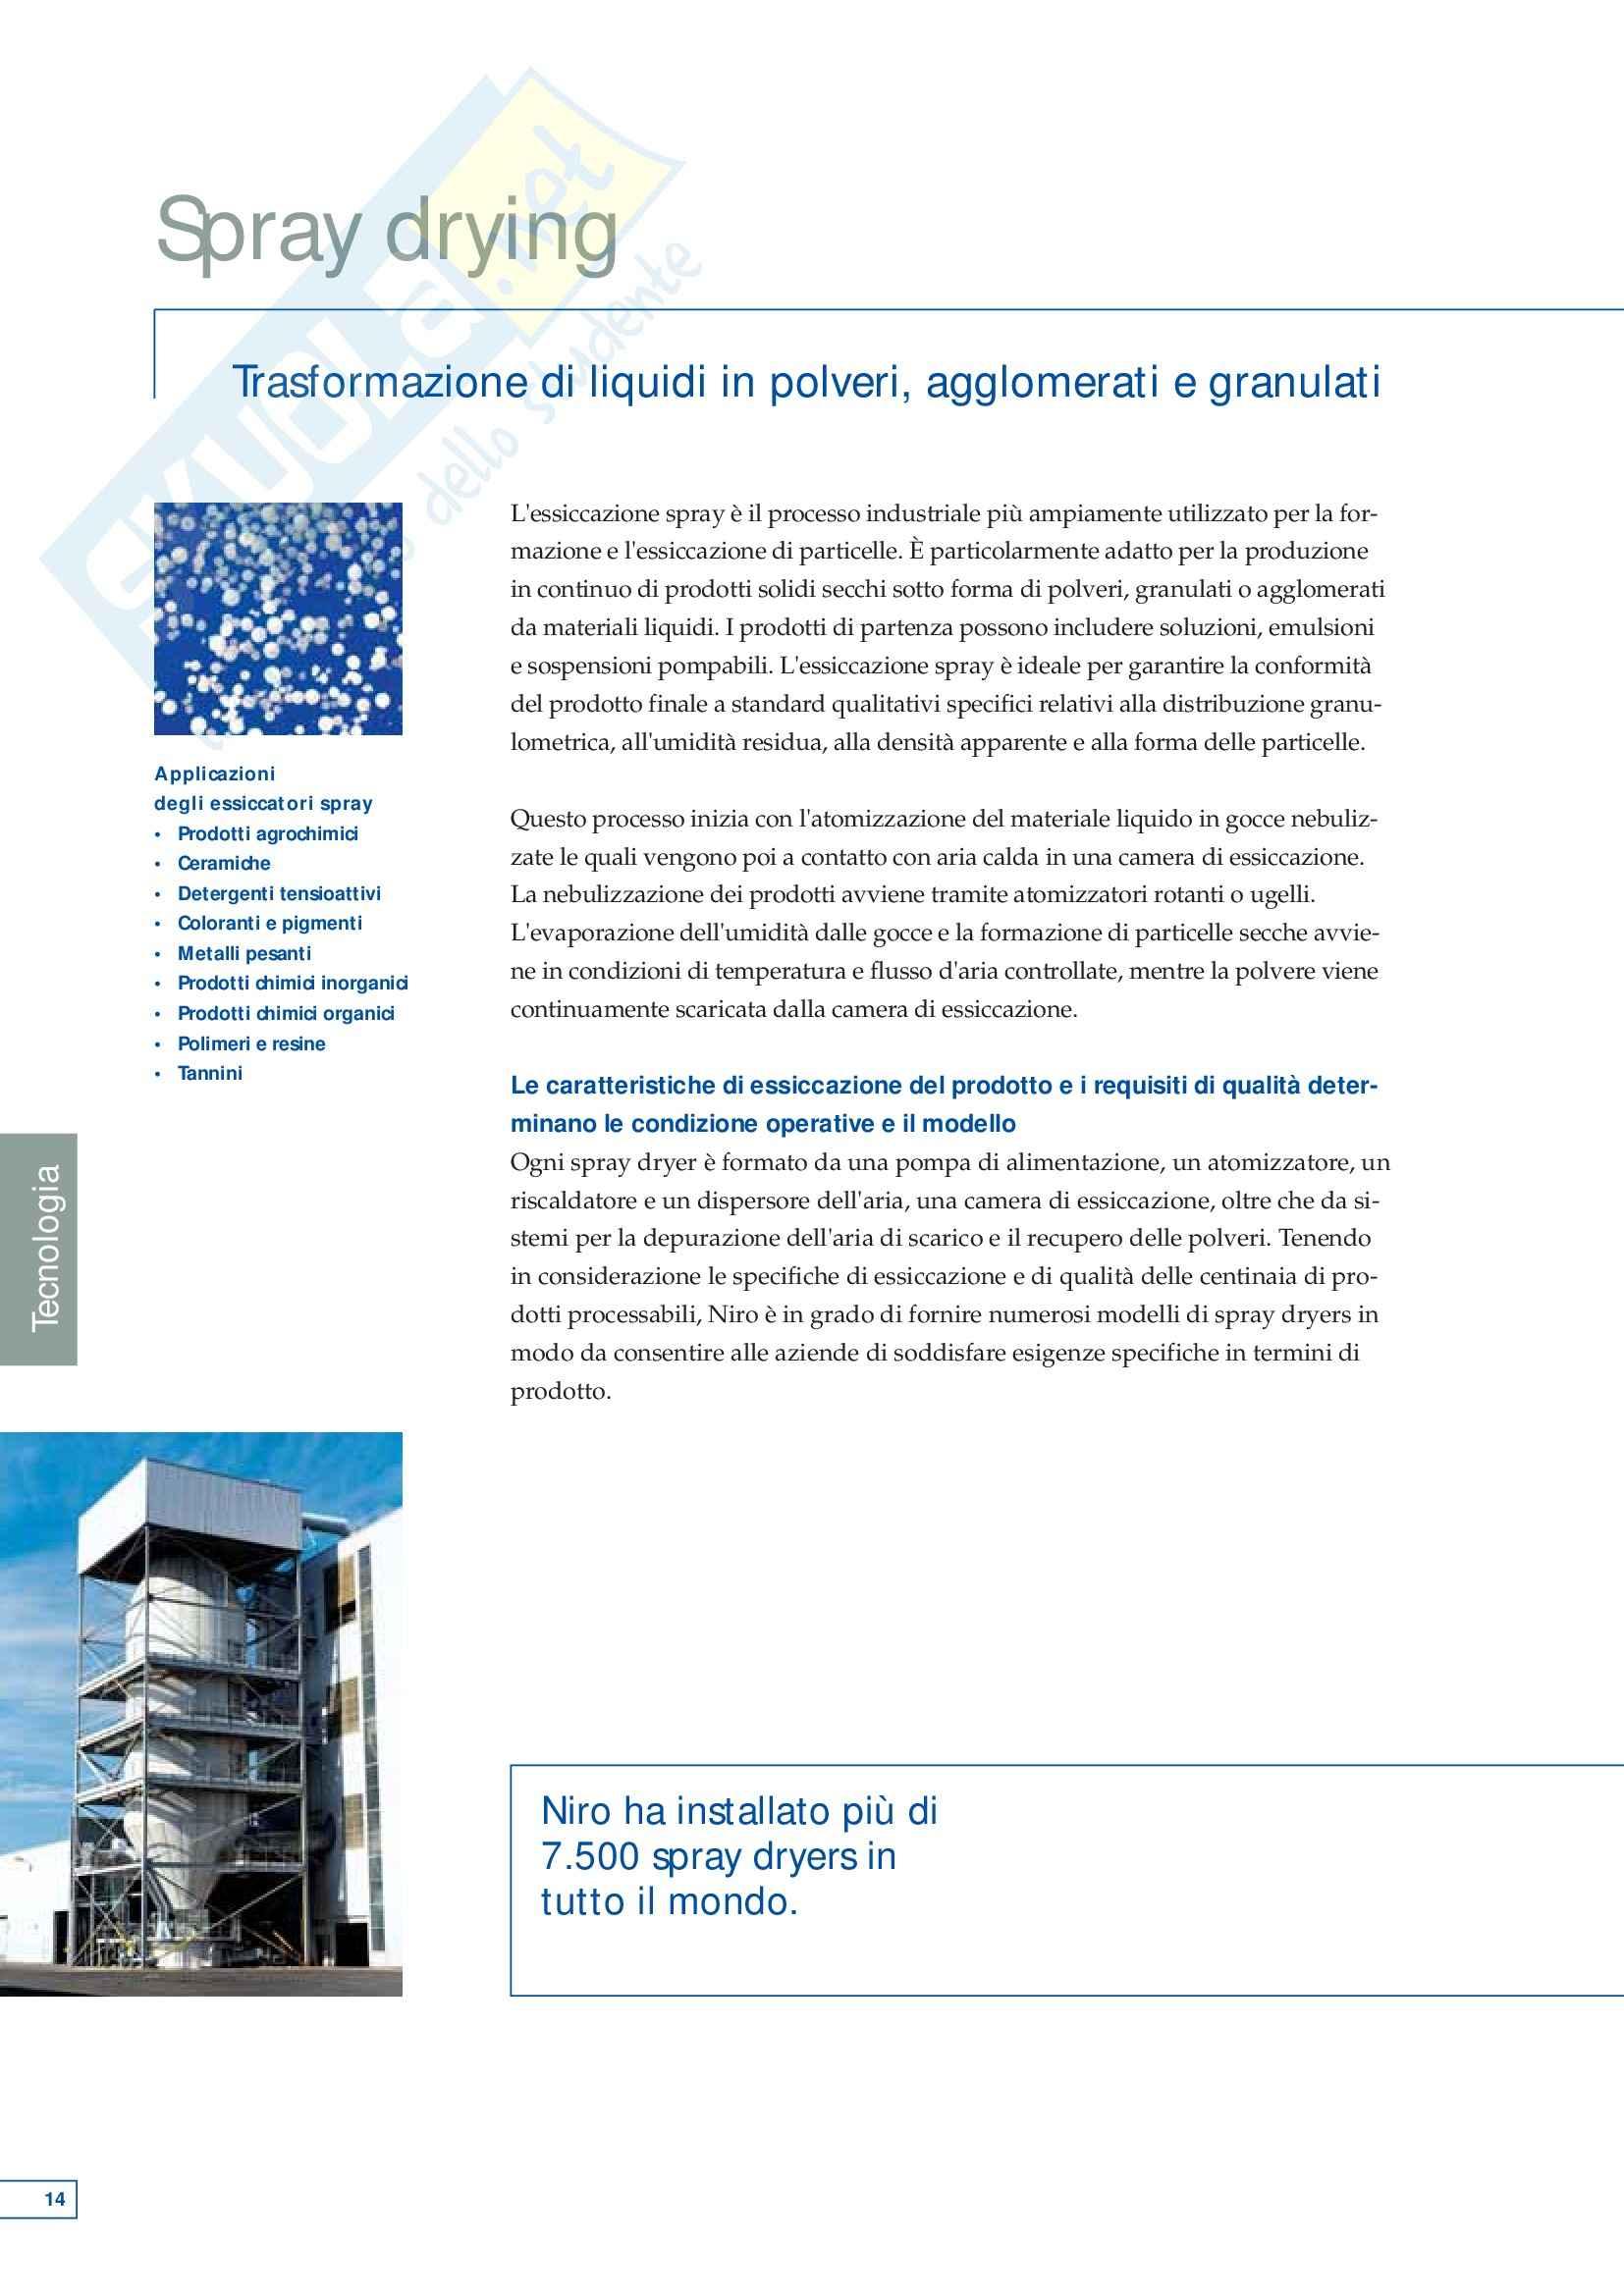 Tecnica farmaceutica - tecnologie di spray drying Pag. 16